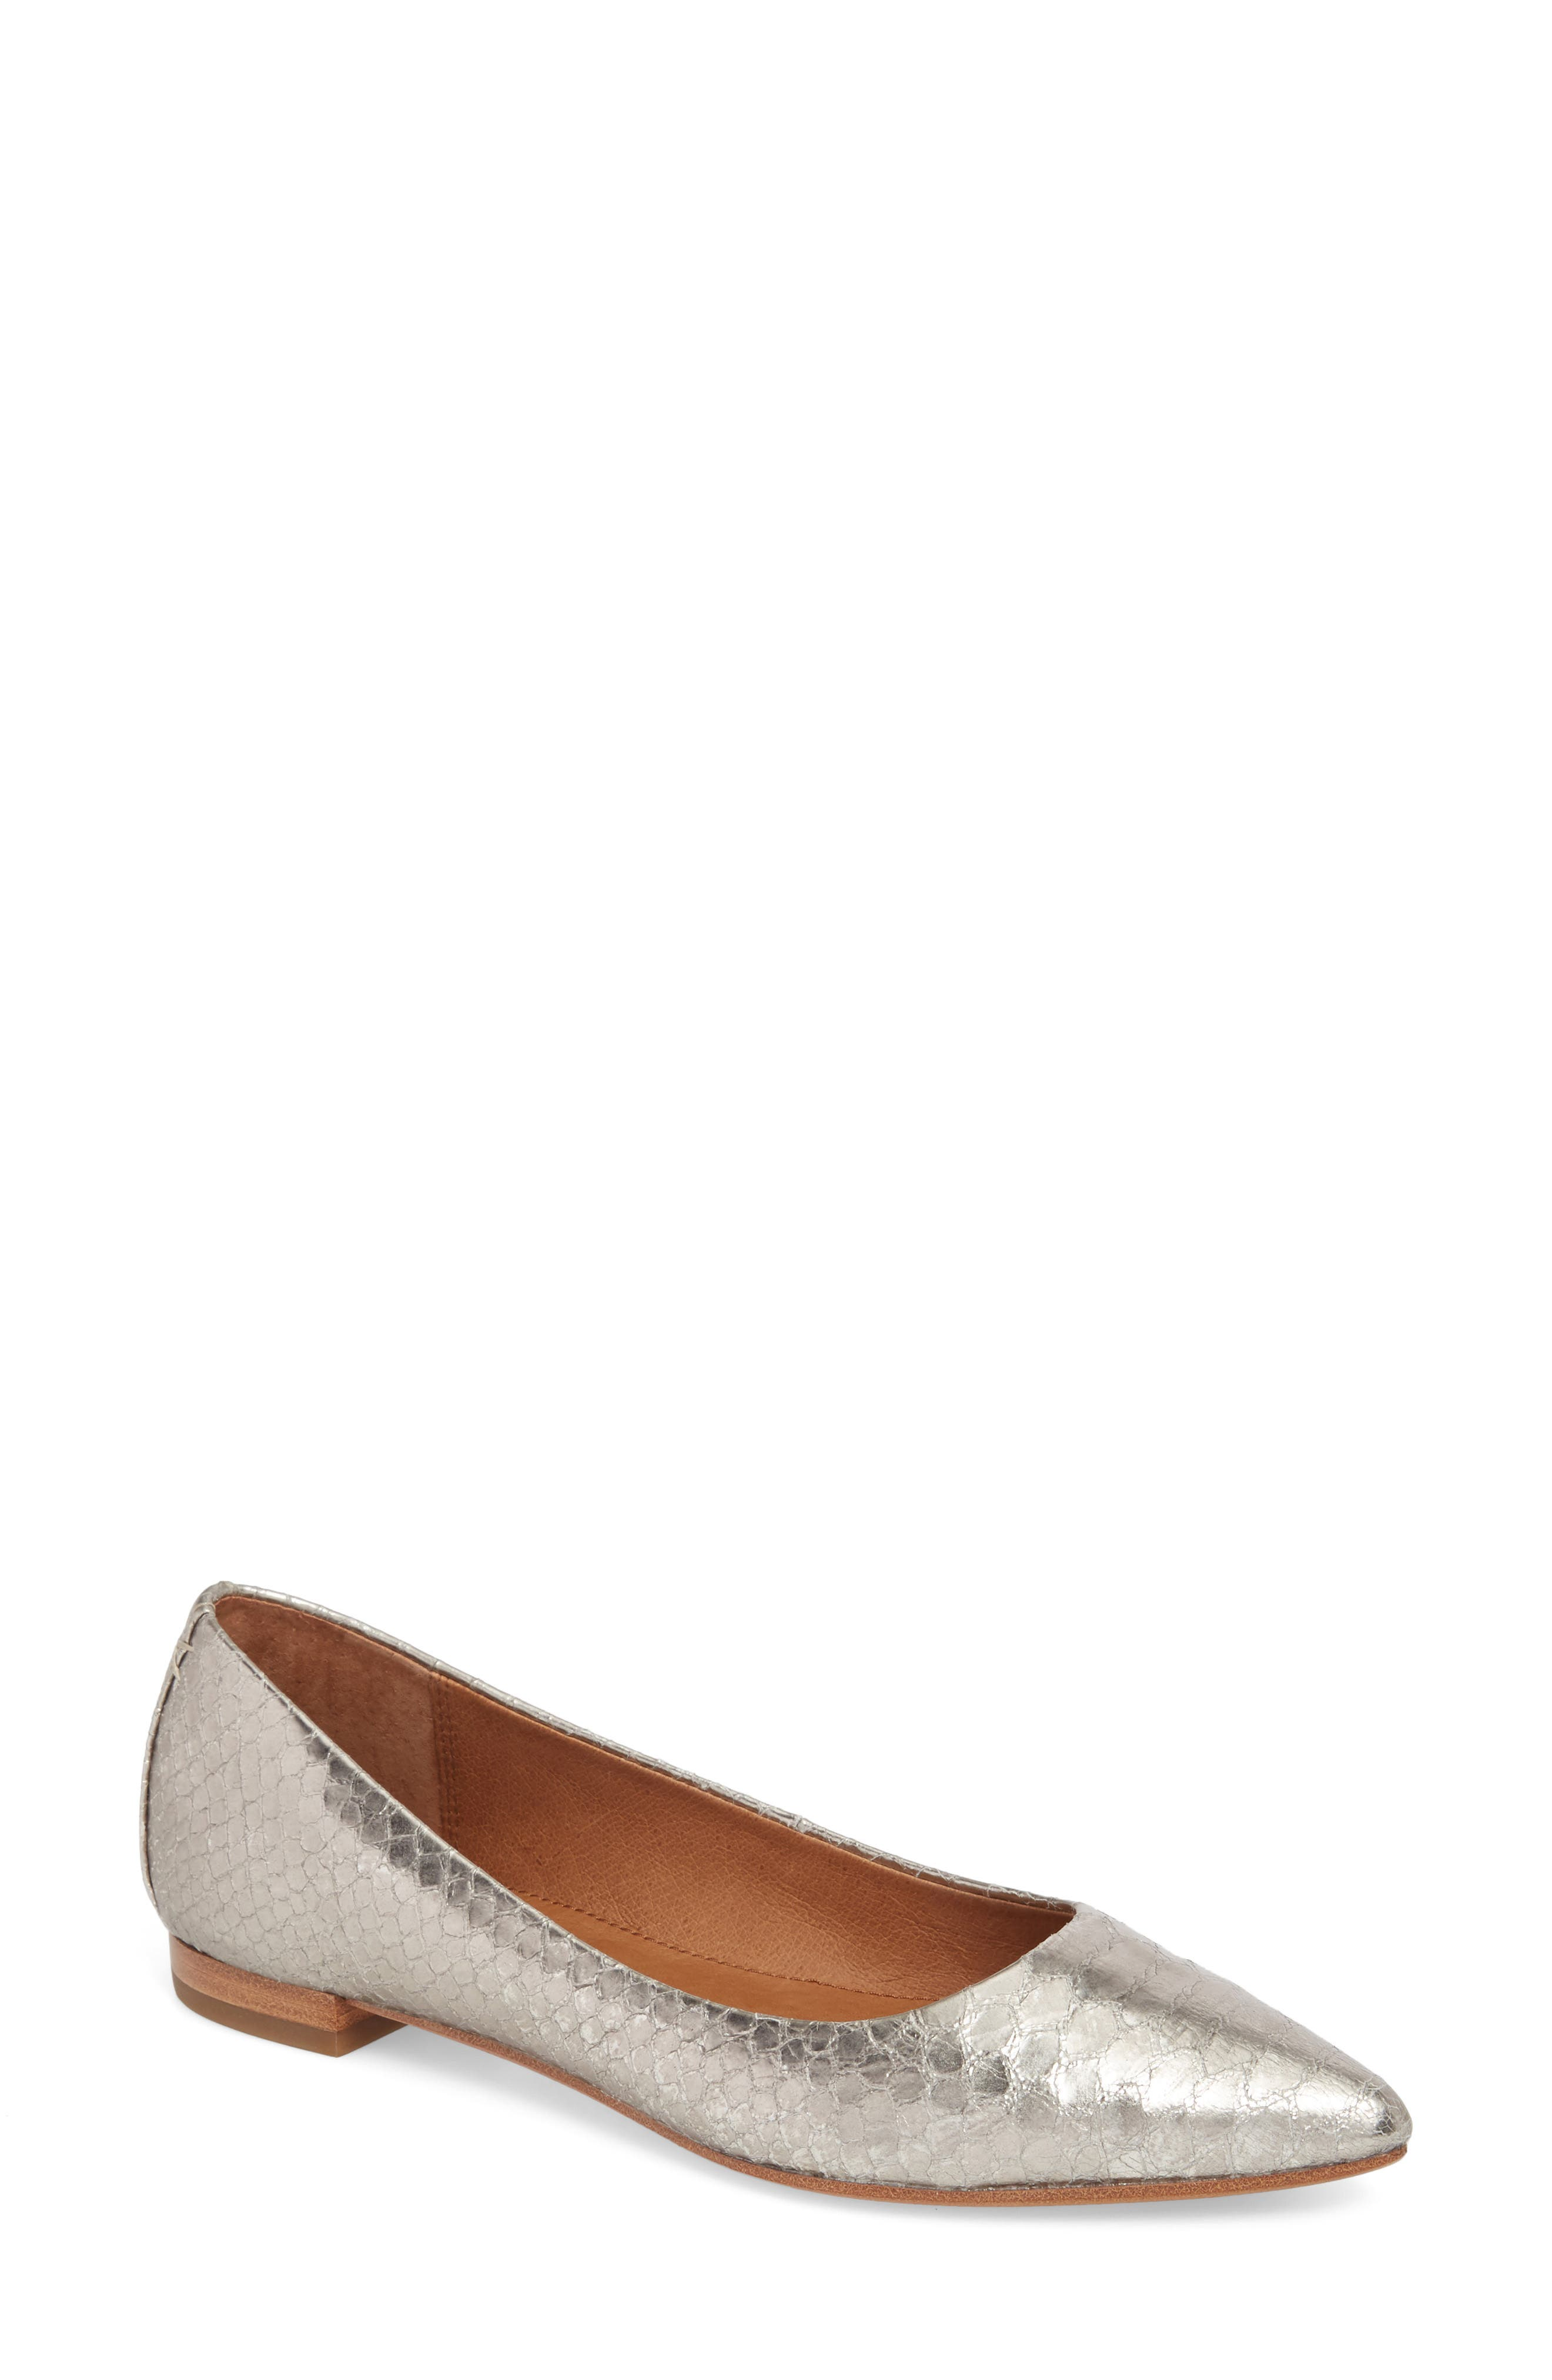 Sienna Pointy Toe Ballet Flat,                             Main thumbnail 1, color,                             040